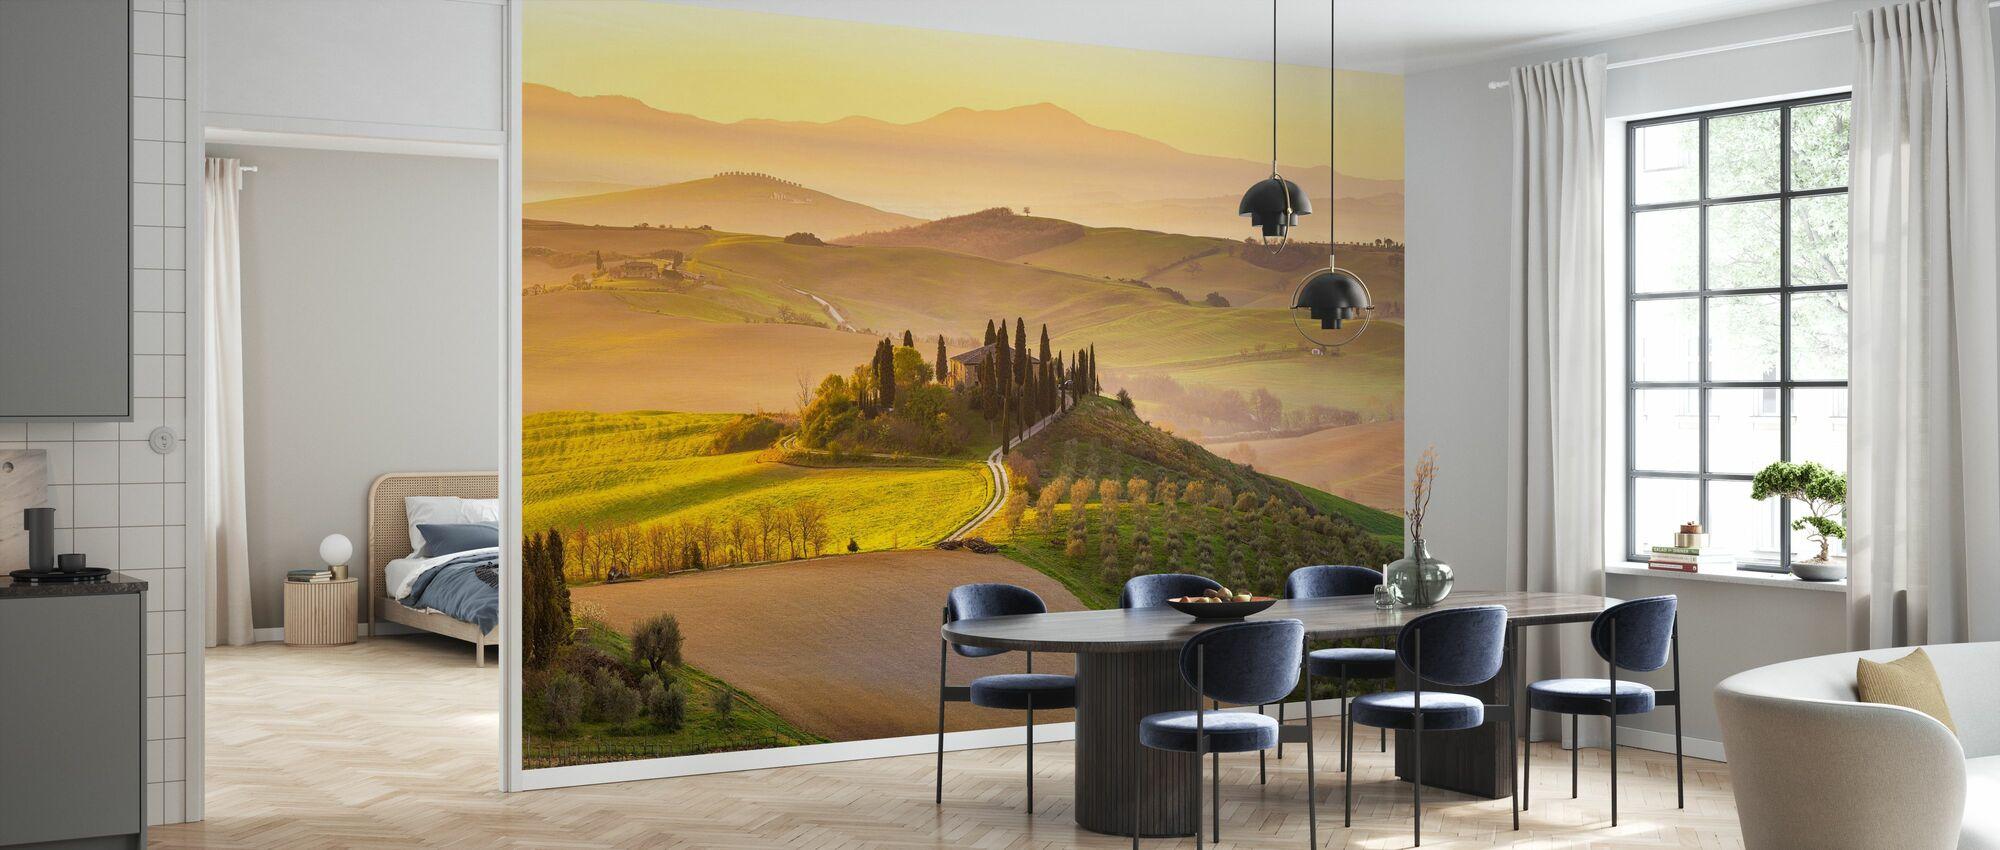 Tuscany Vineyard - Wallpaper - Kitchen